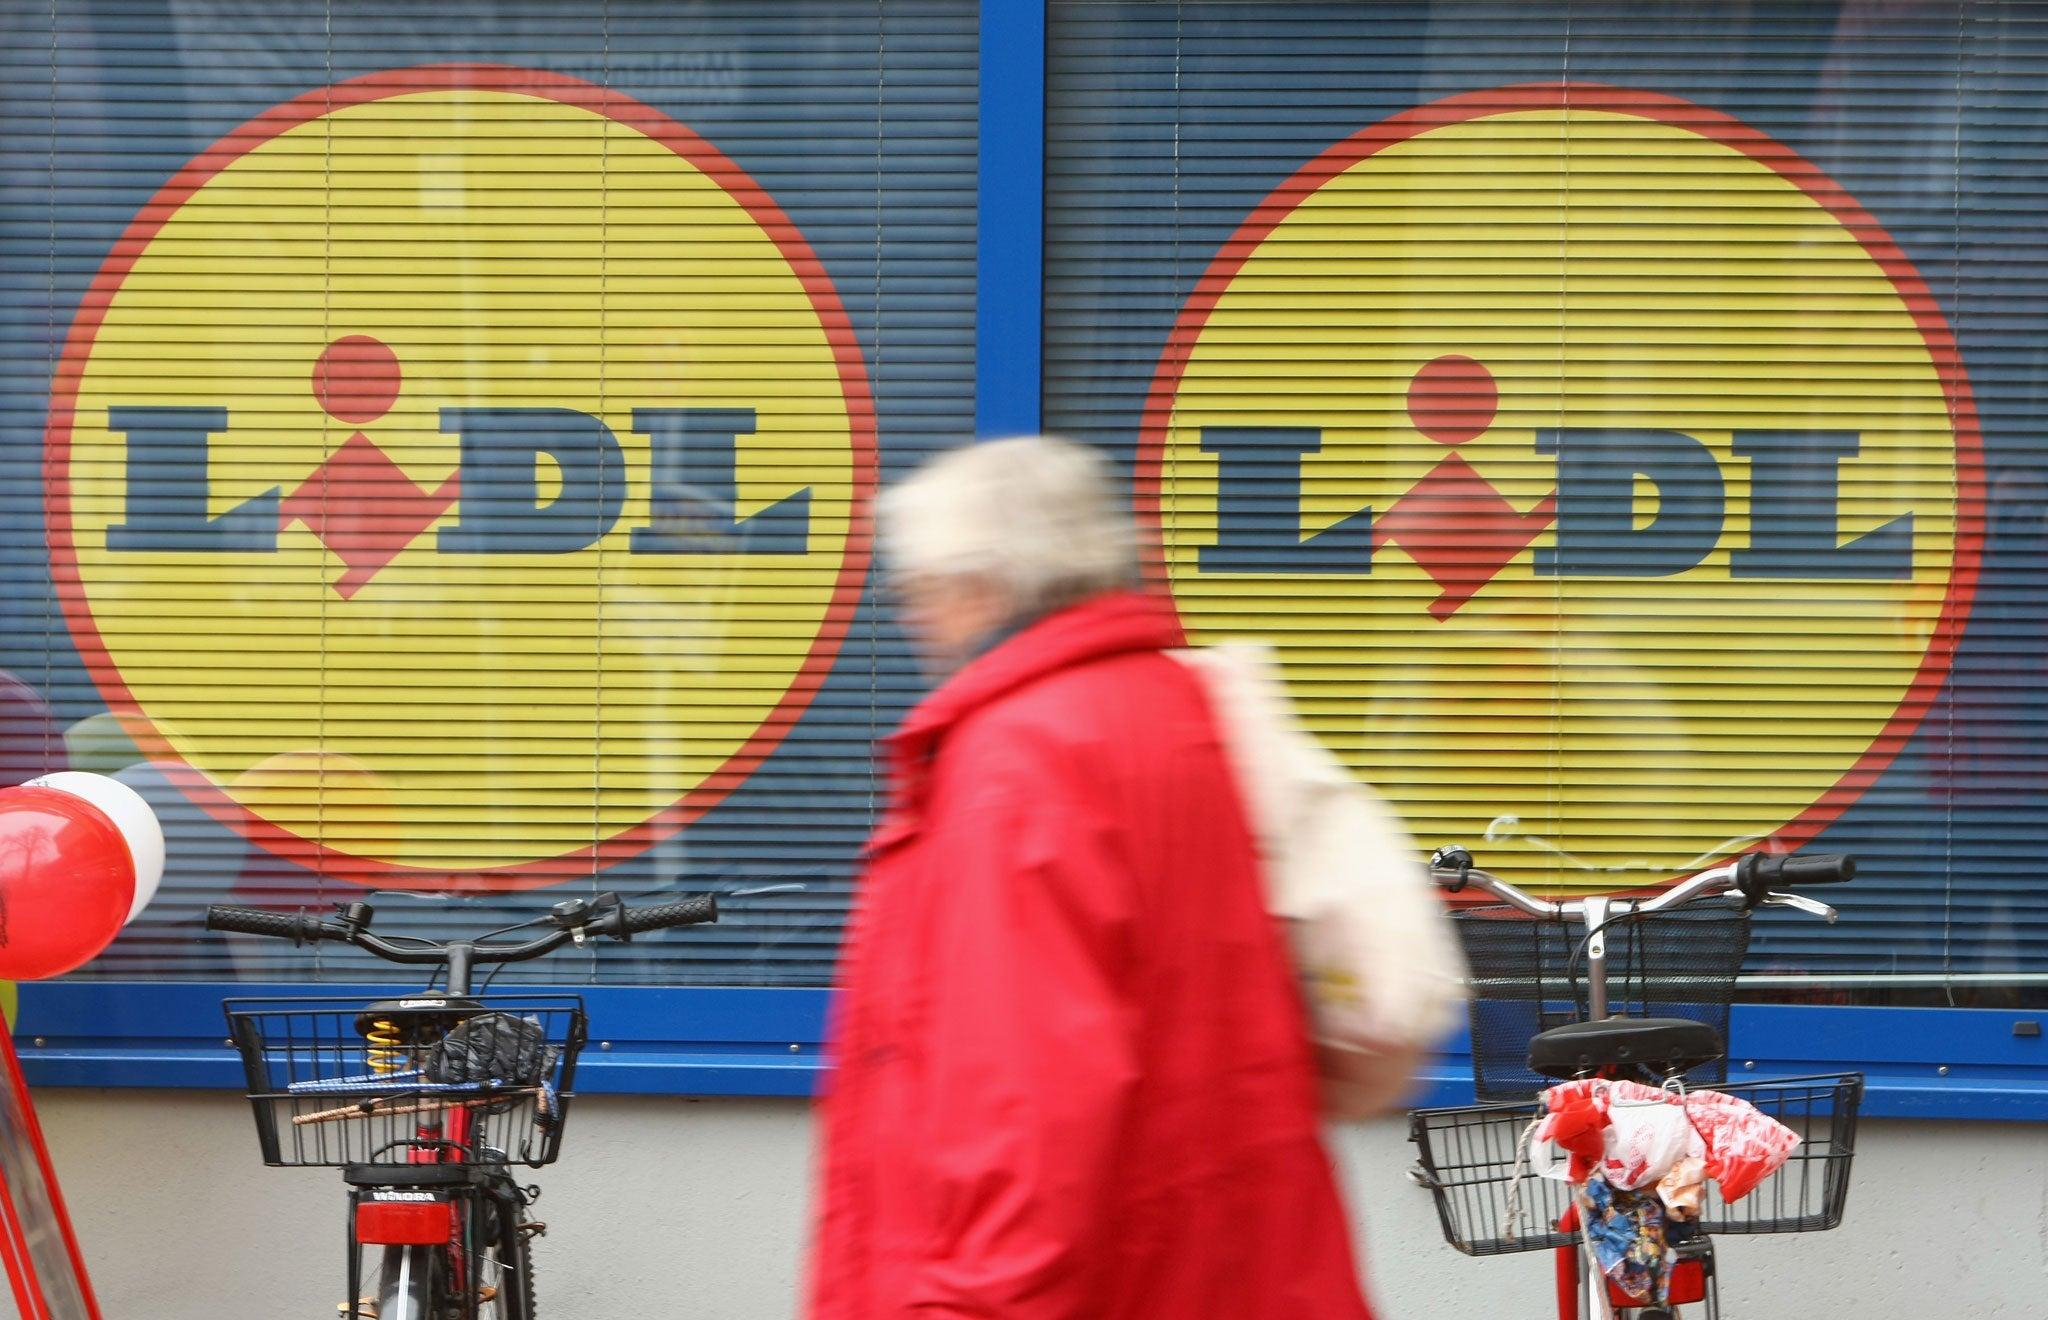 Lidl and Aldi pose 'biggest supermarket threat ever' | The